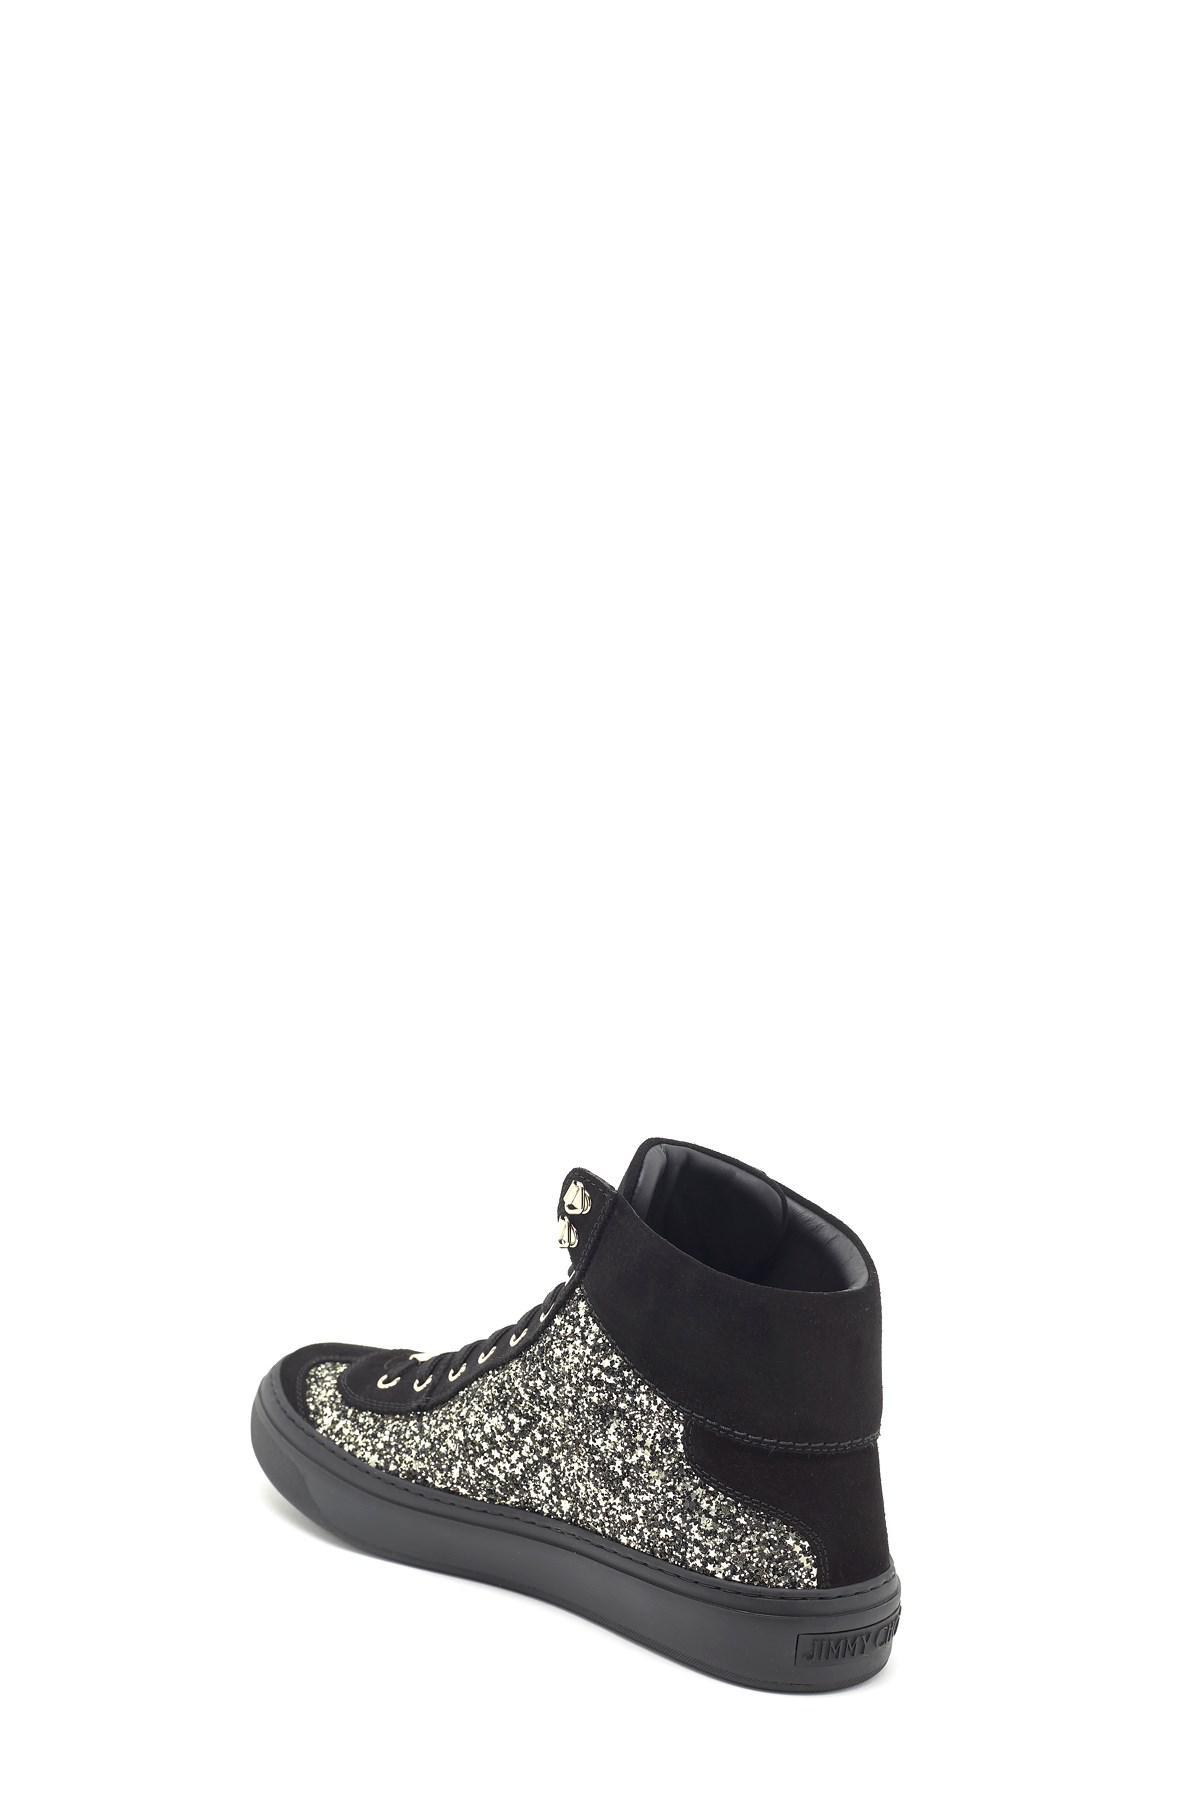 6007adf0e679 Jimmy Choo - Black  argyle  Sneakers for Men - Lyst. View fullscreen